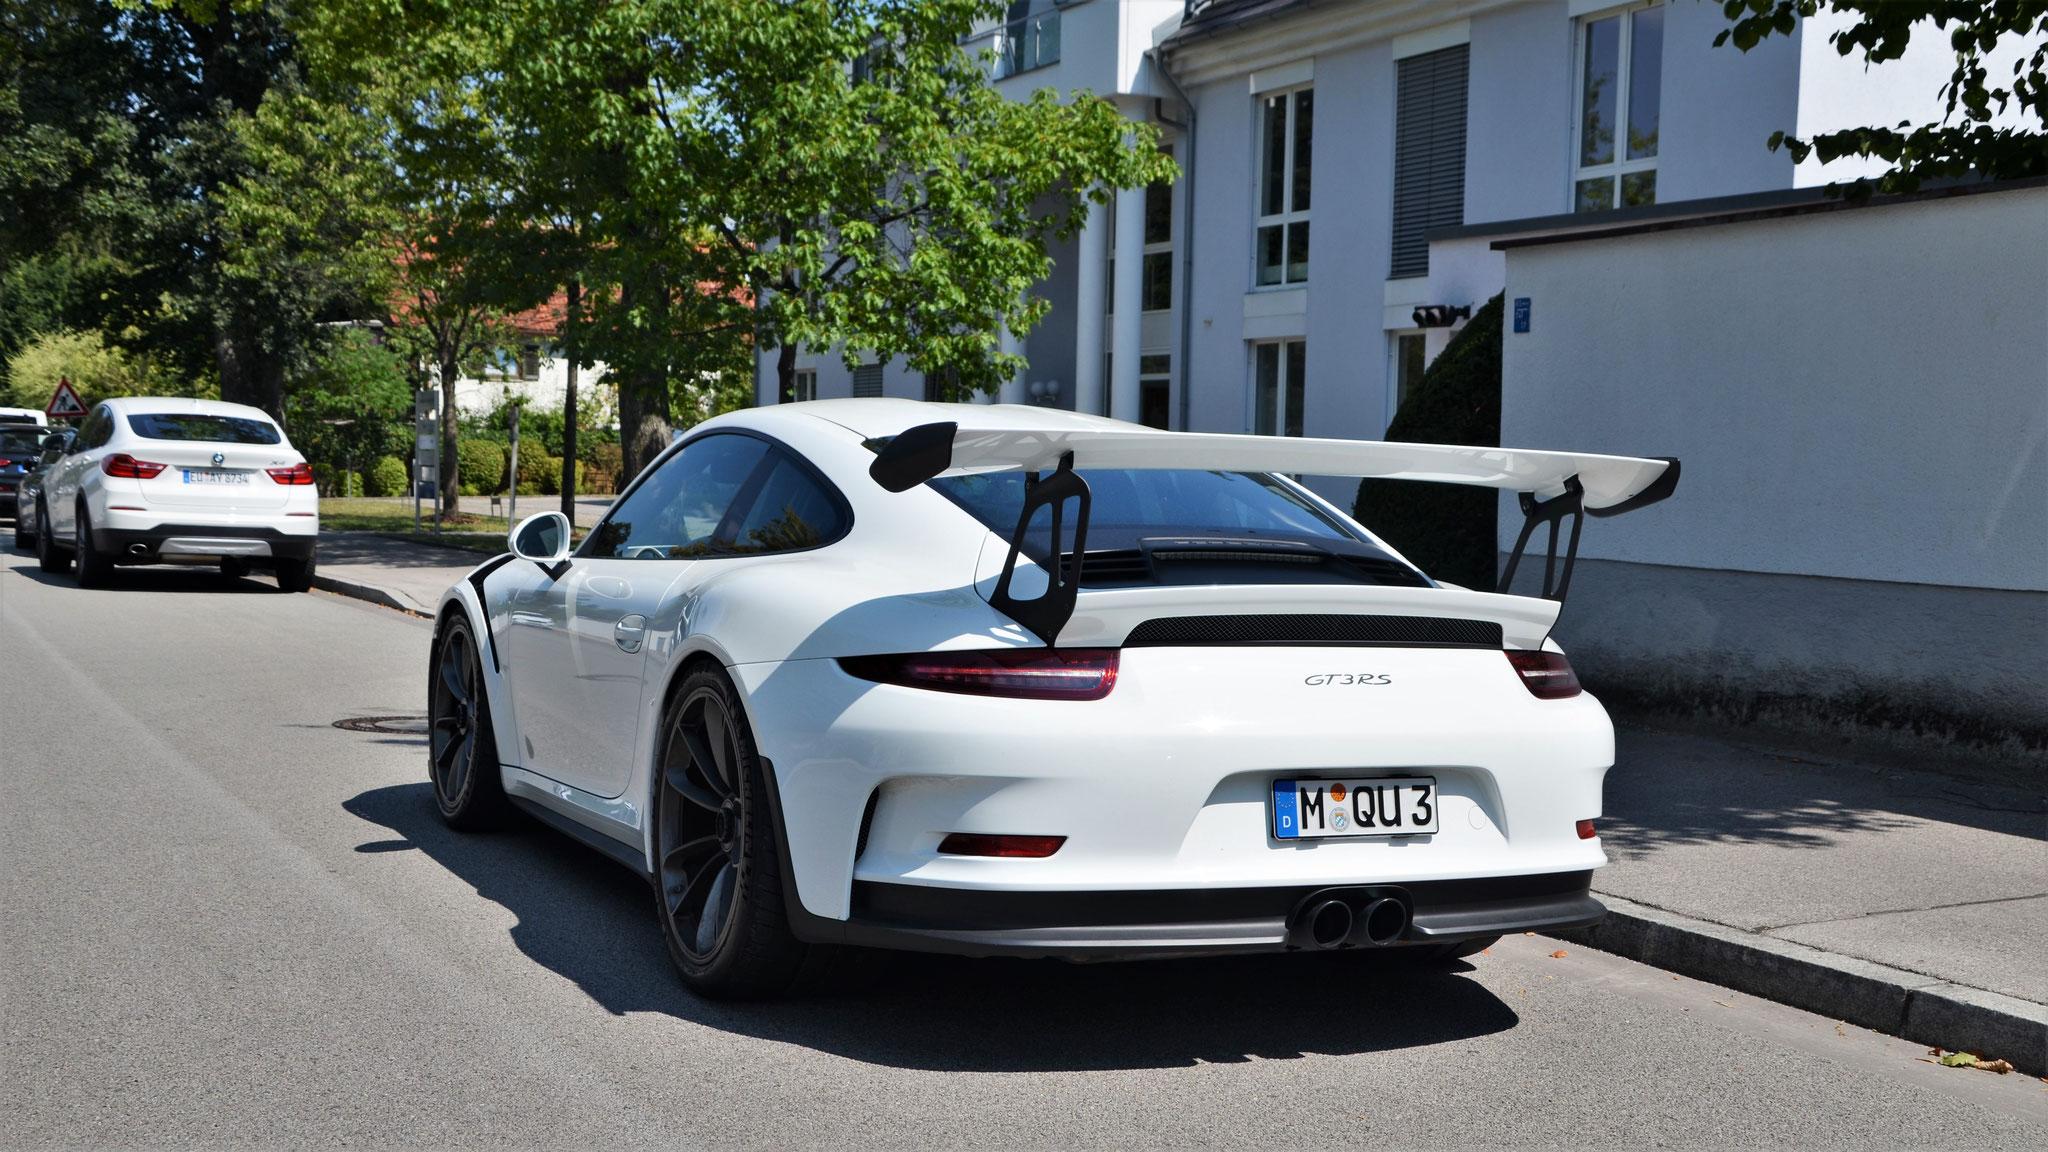 Porsche 911 GT3 RS - M-QU-3